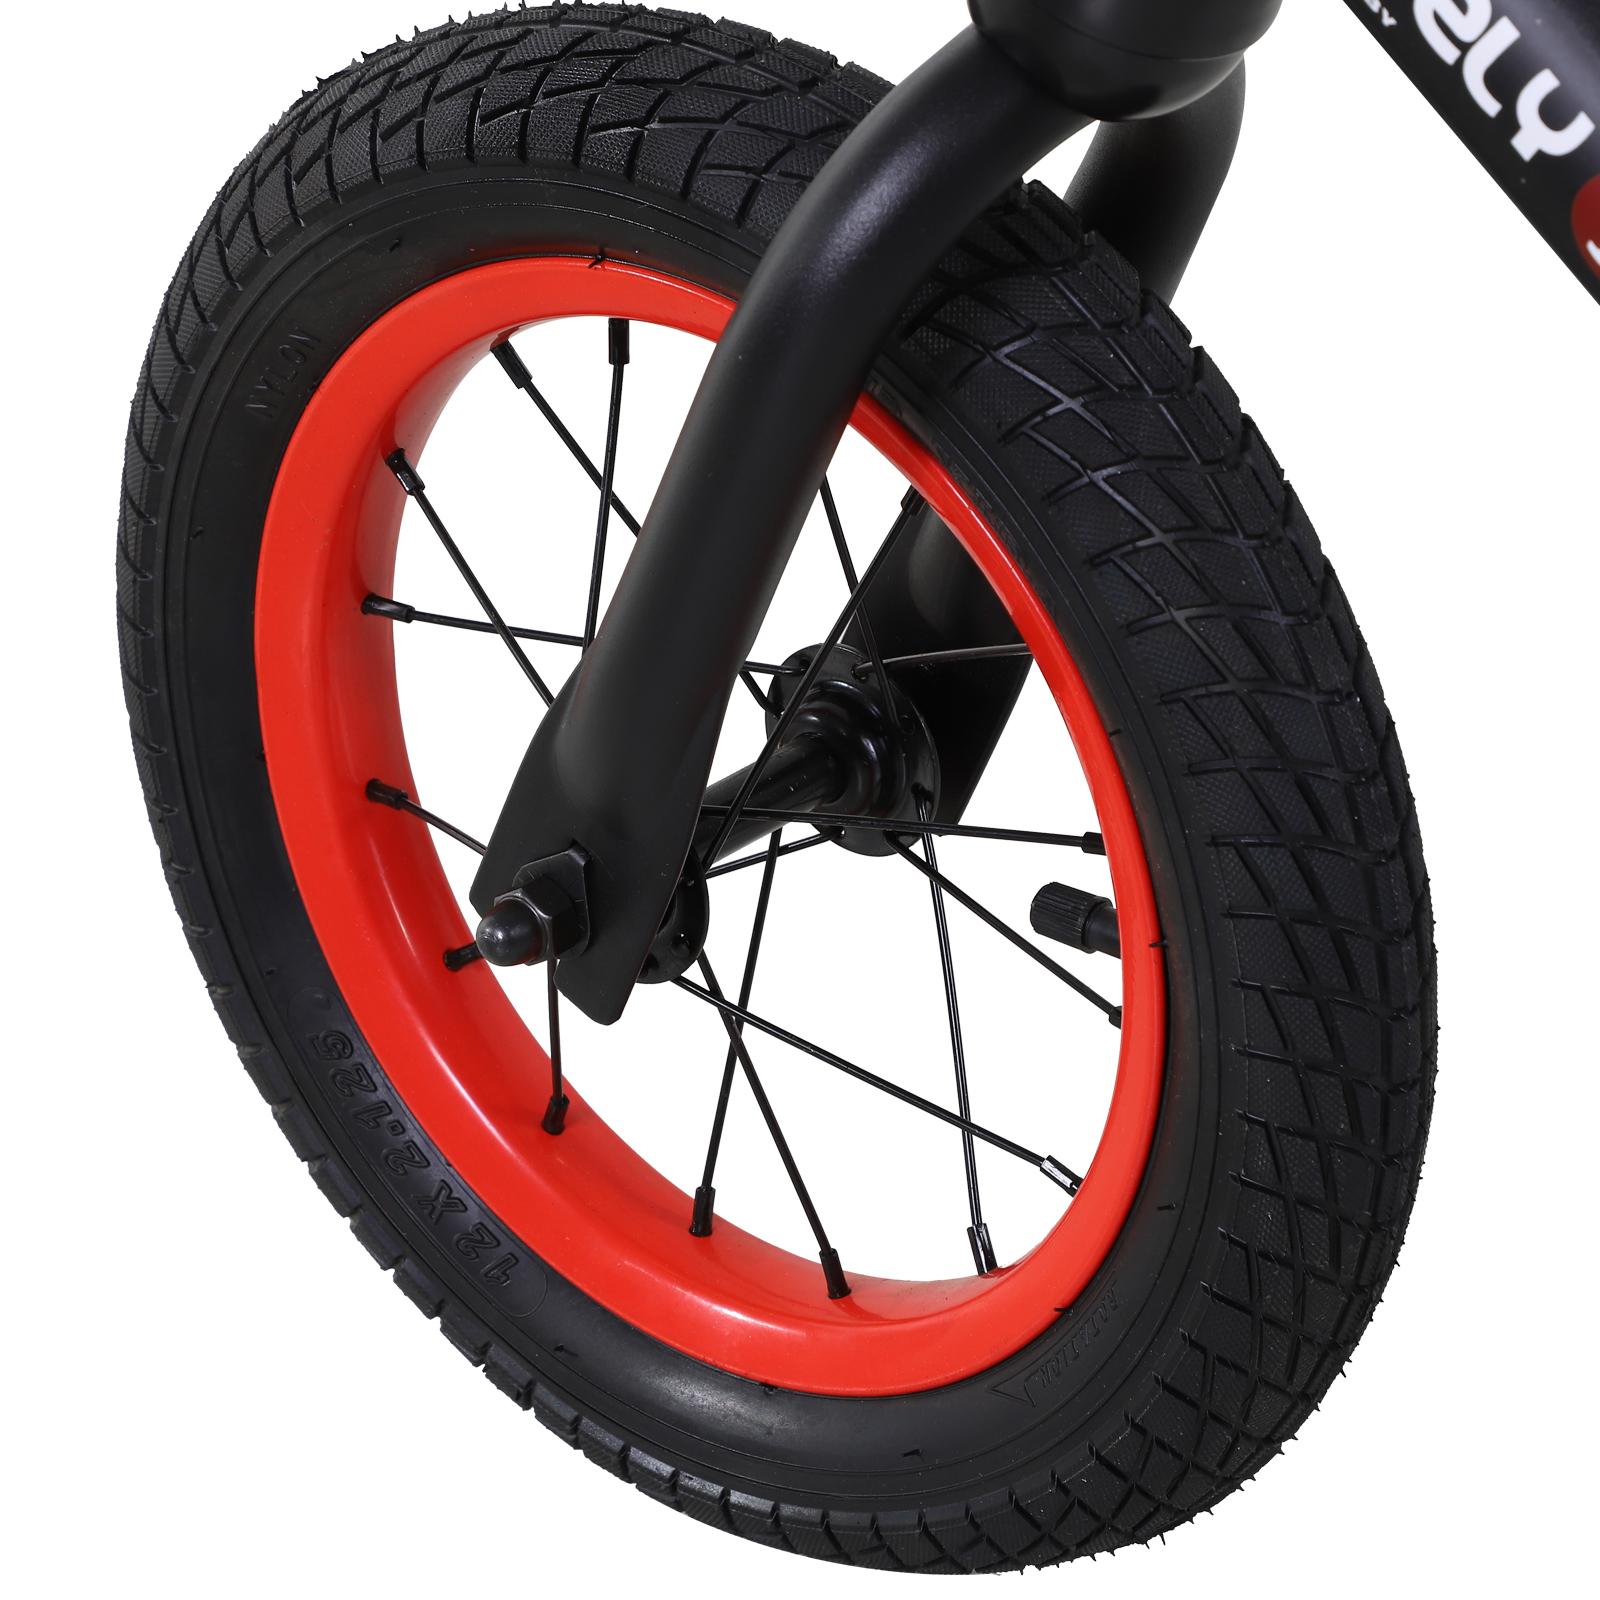 Bicicleta-sin-Pedales-de-Altura-de-Asiento-Regulable-31-45cm-2-5-Anos miniatura 10